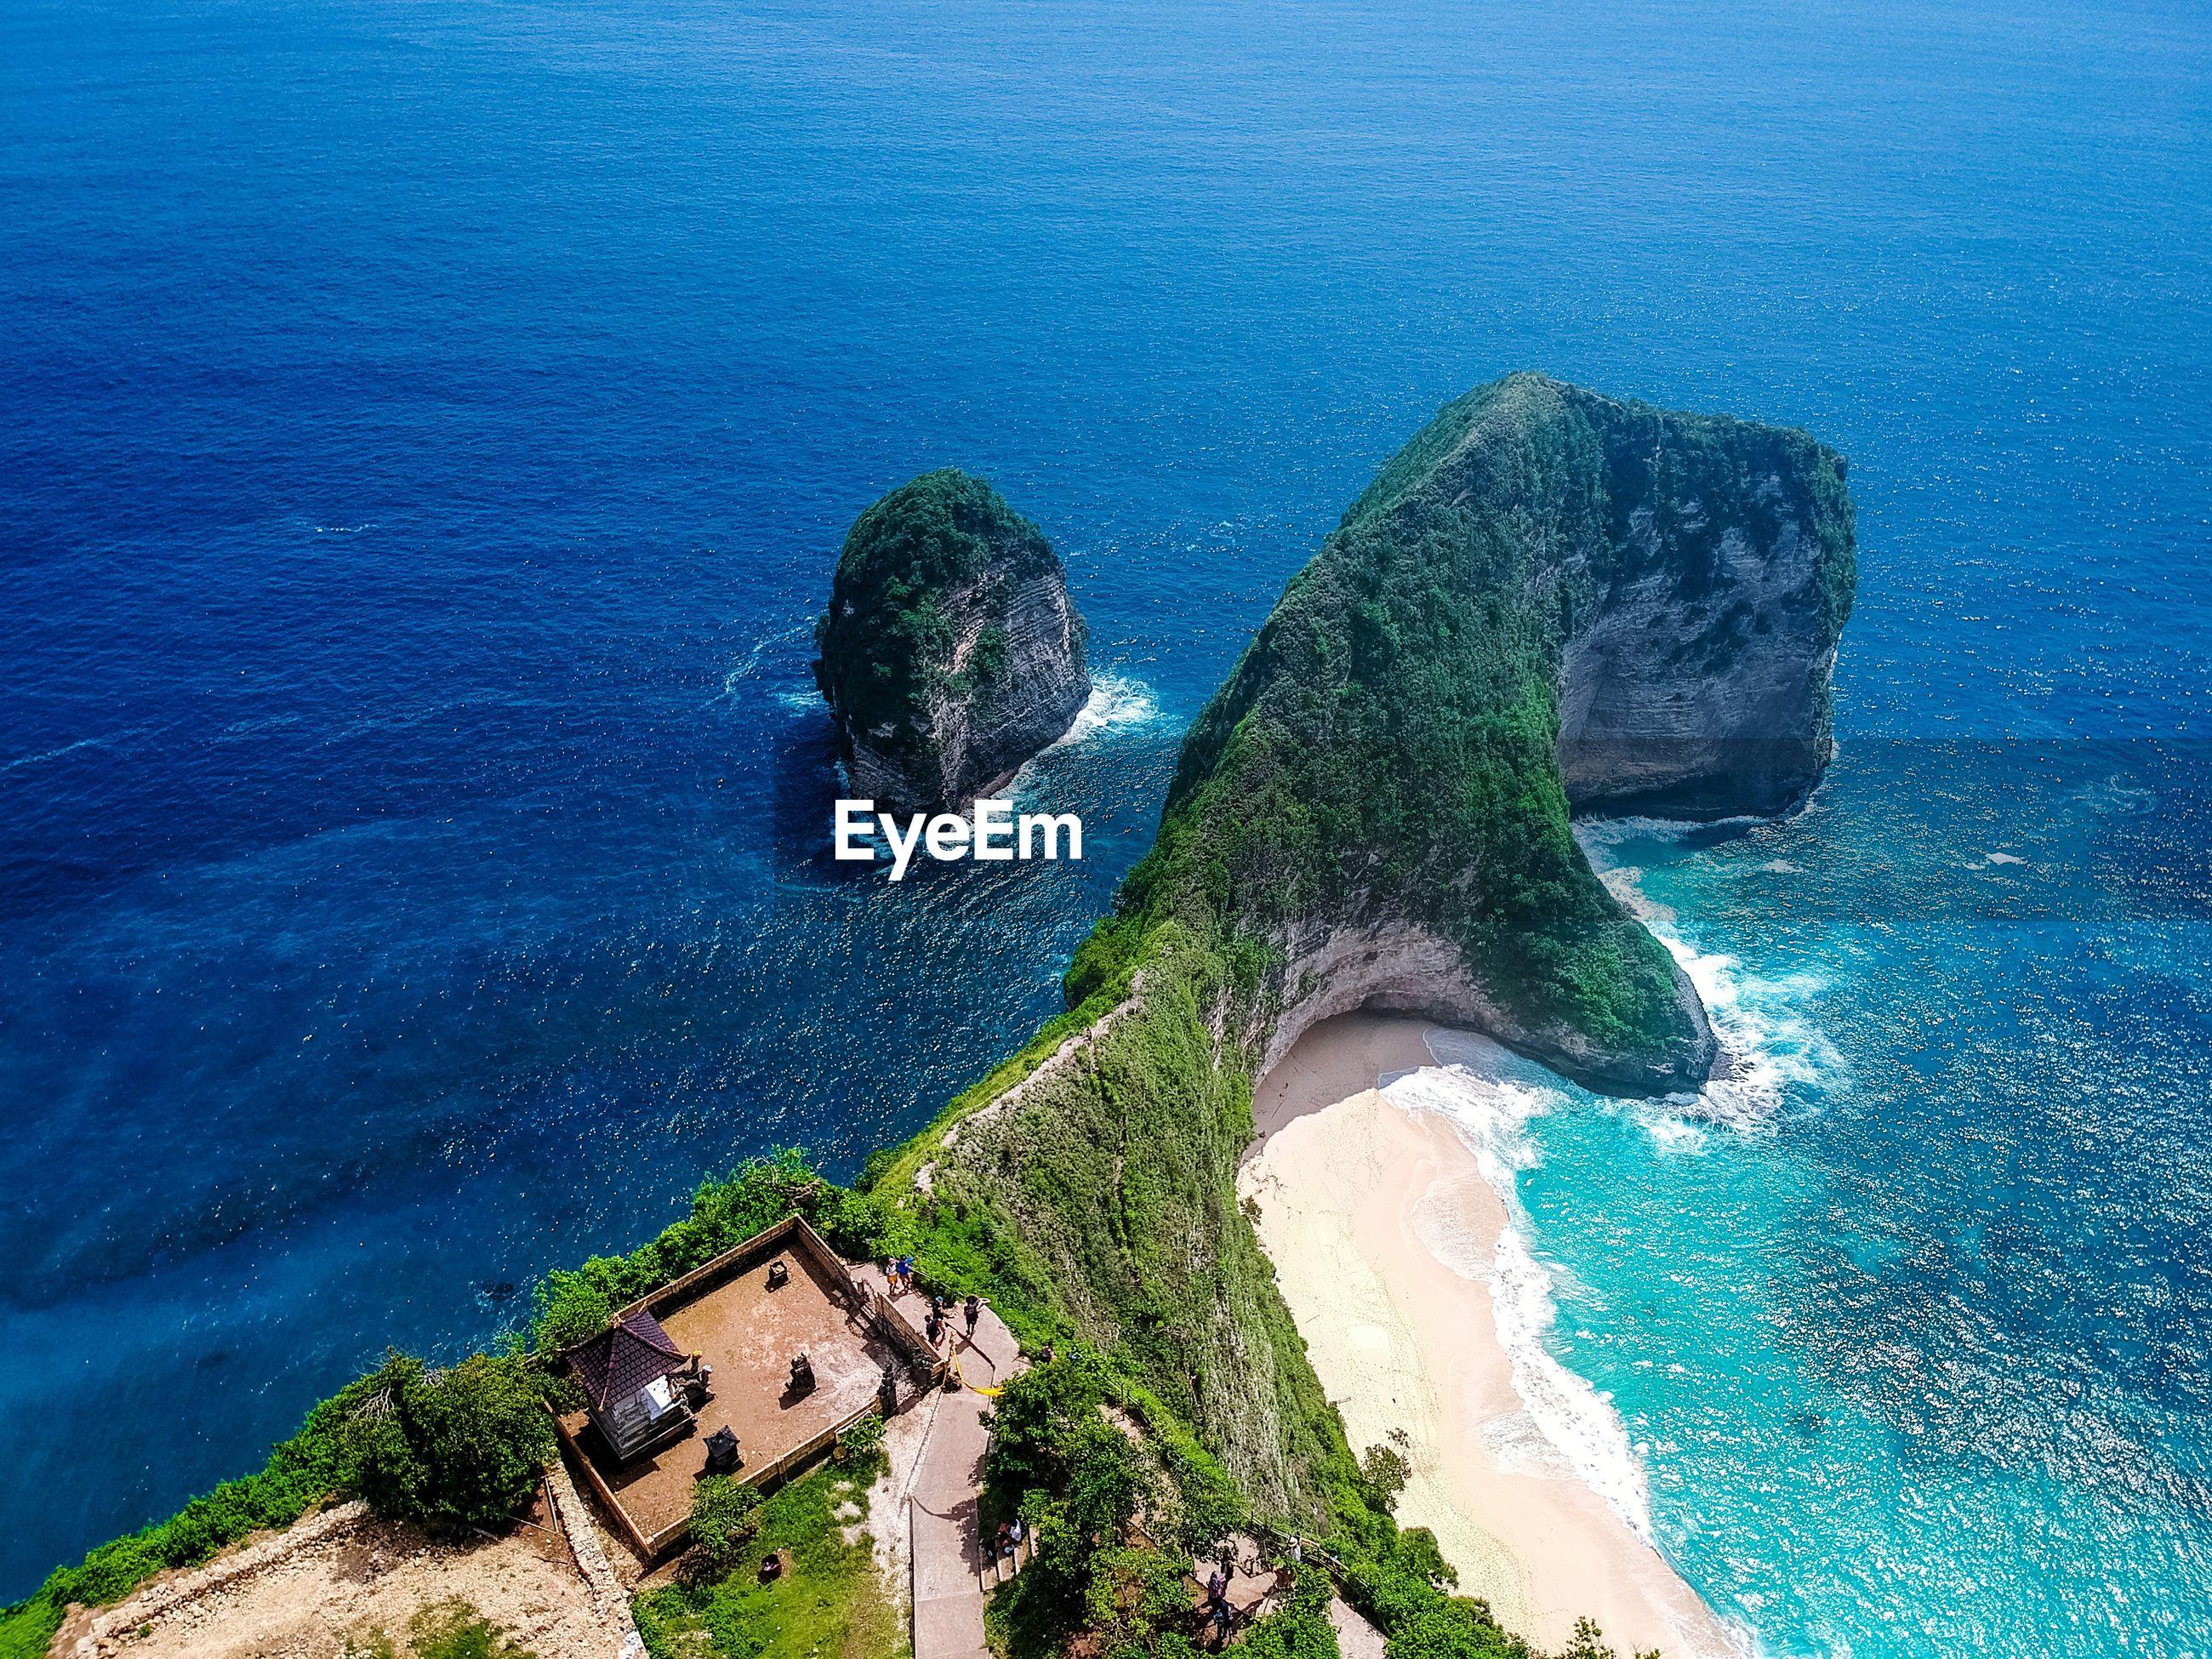 HIGH ANGLE VIEW OF BEACH AND ISLAND